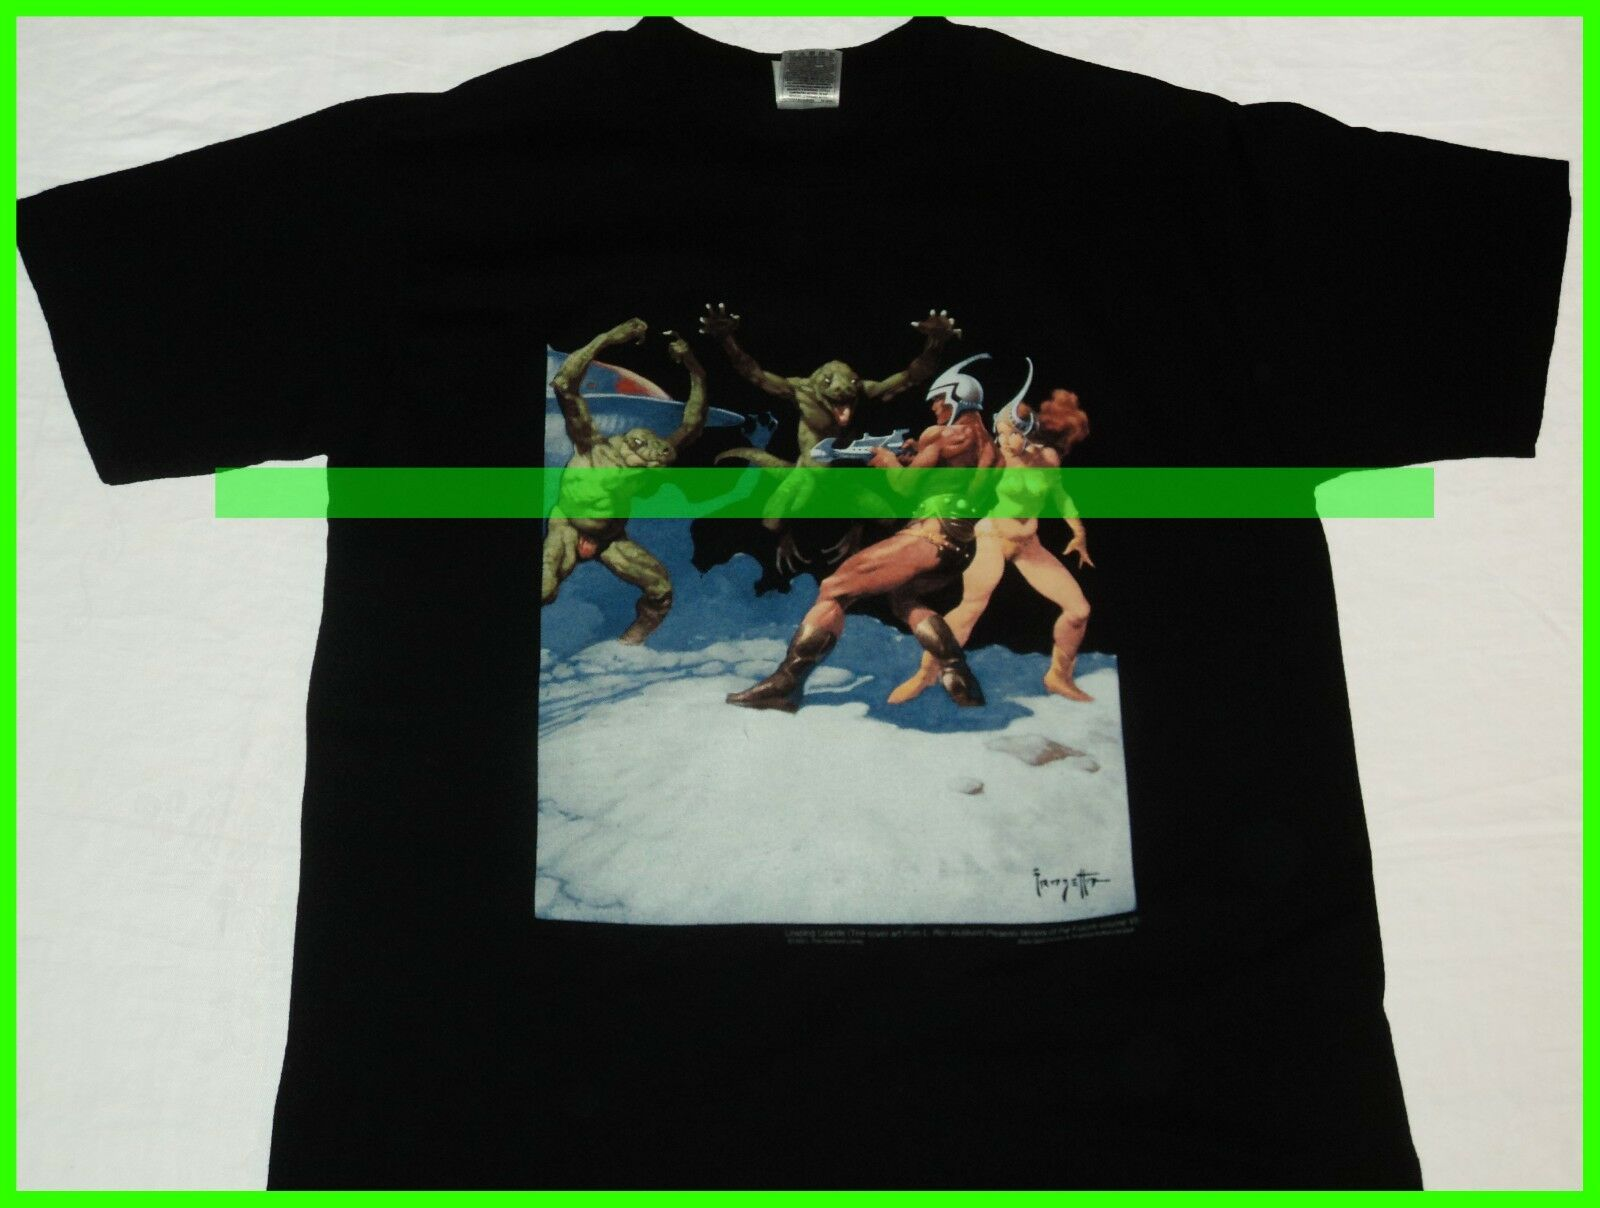 L  RARE Original Frazetta vtg 1989 shirt Vintage fantasy comics